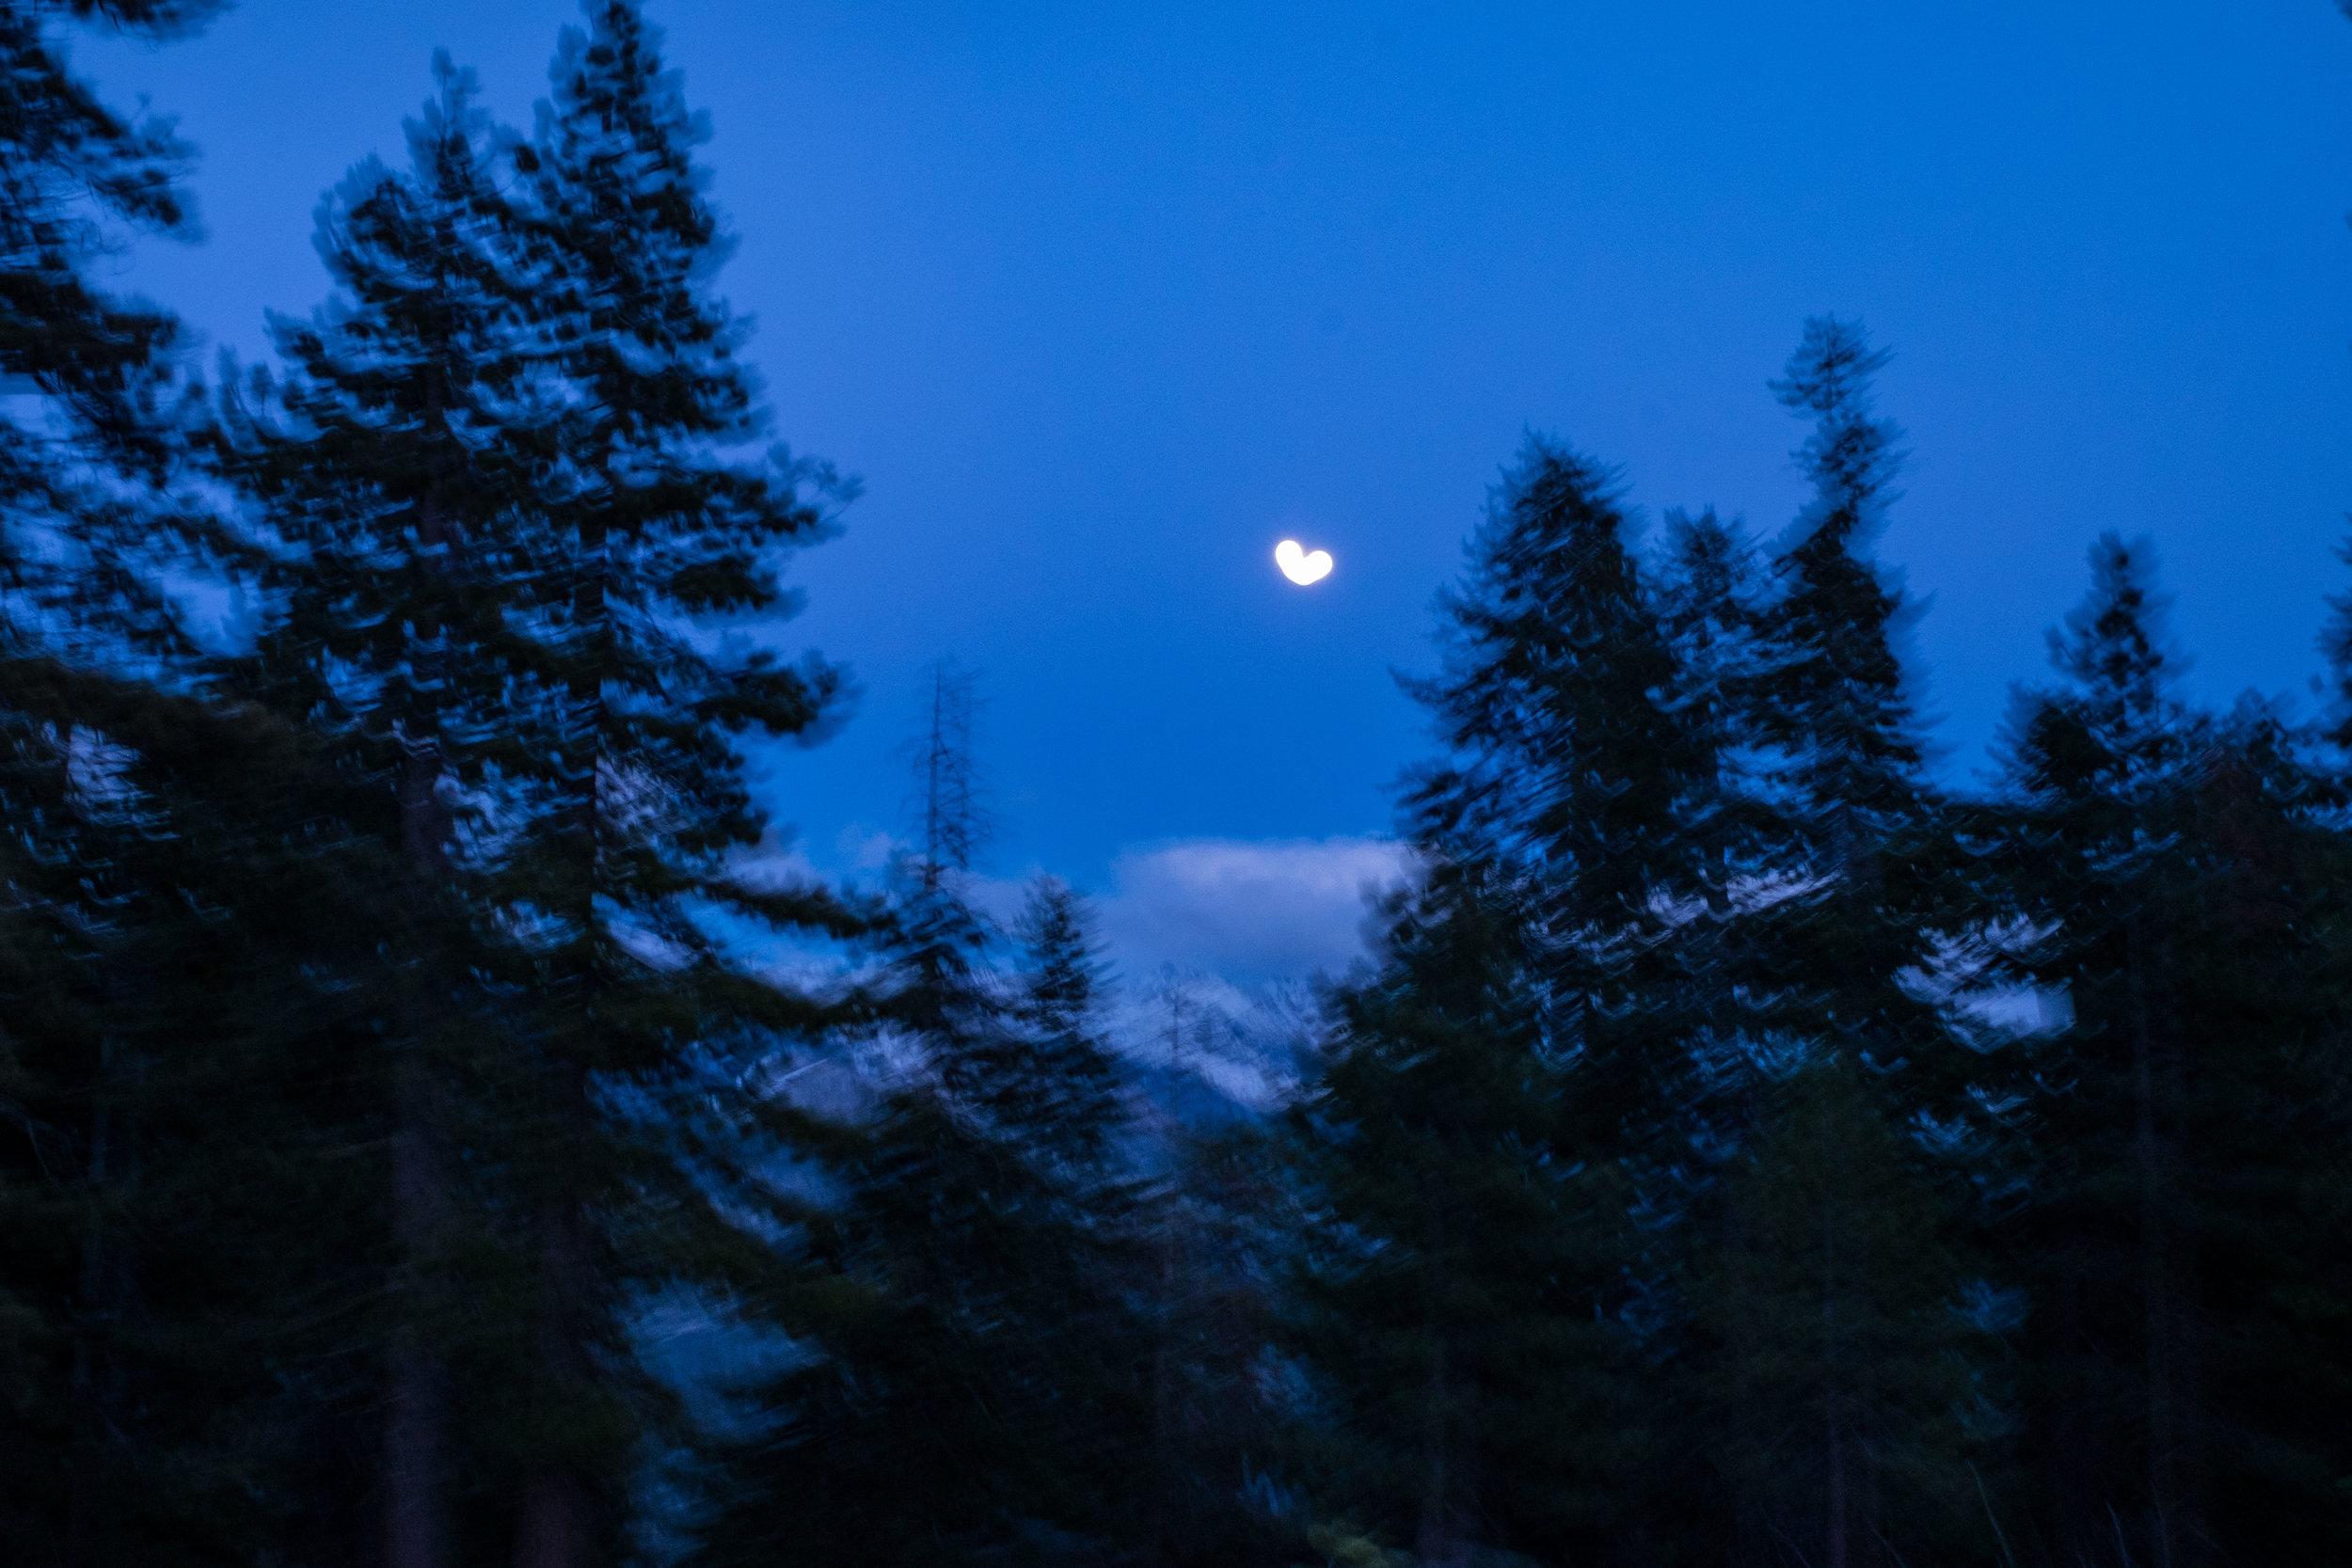 20160520-JI-Yosemite National Park-_DSF7355.jpg